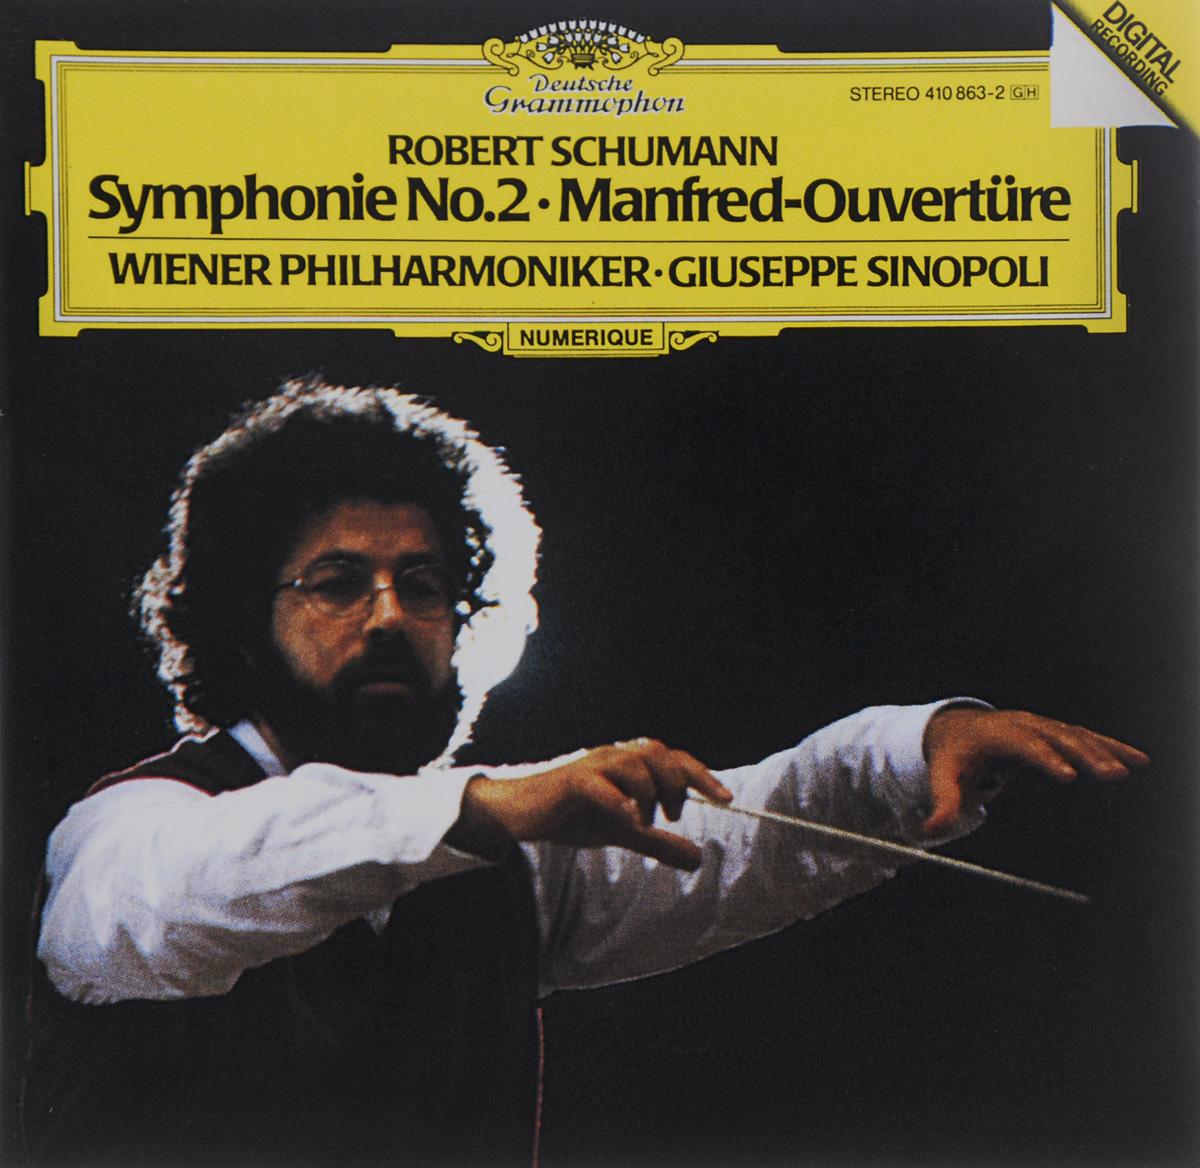 Wiener Philharmoniker,Джузеппе Синополи Giuseppe Sinopoli. Schumann. Symphony No. 2 / Manfred-Ouverture münchner philharmoniker elbphilharmonie hamburg